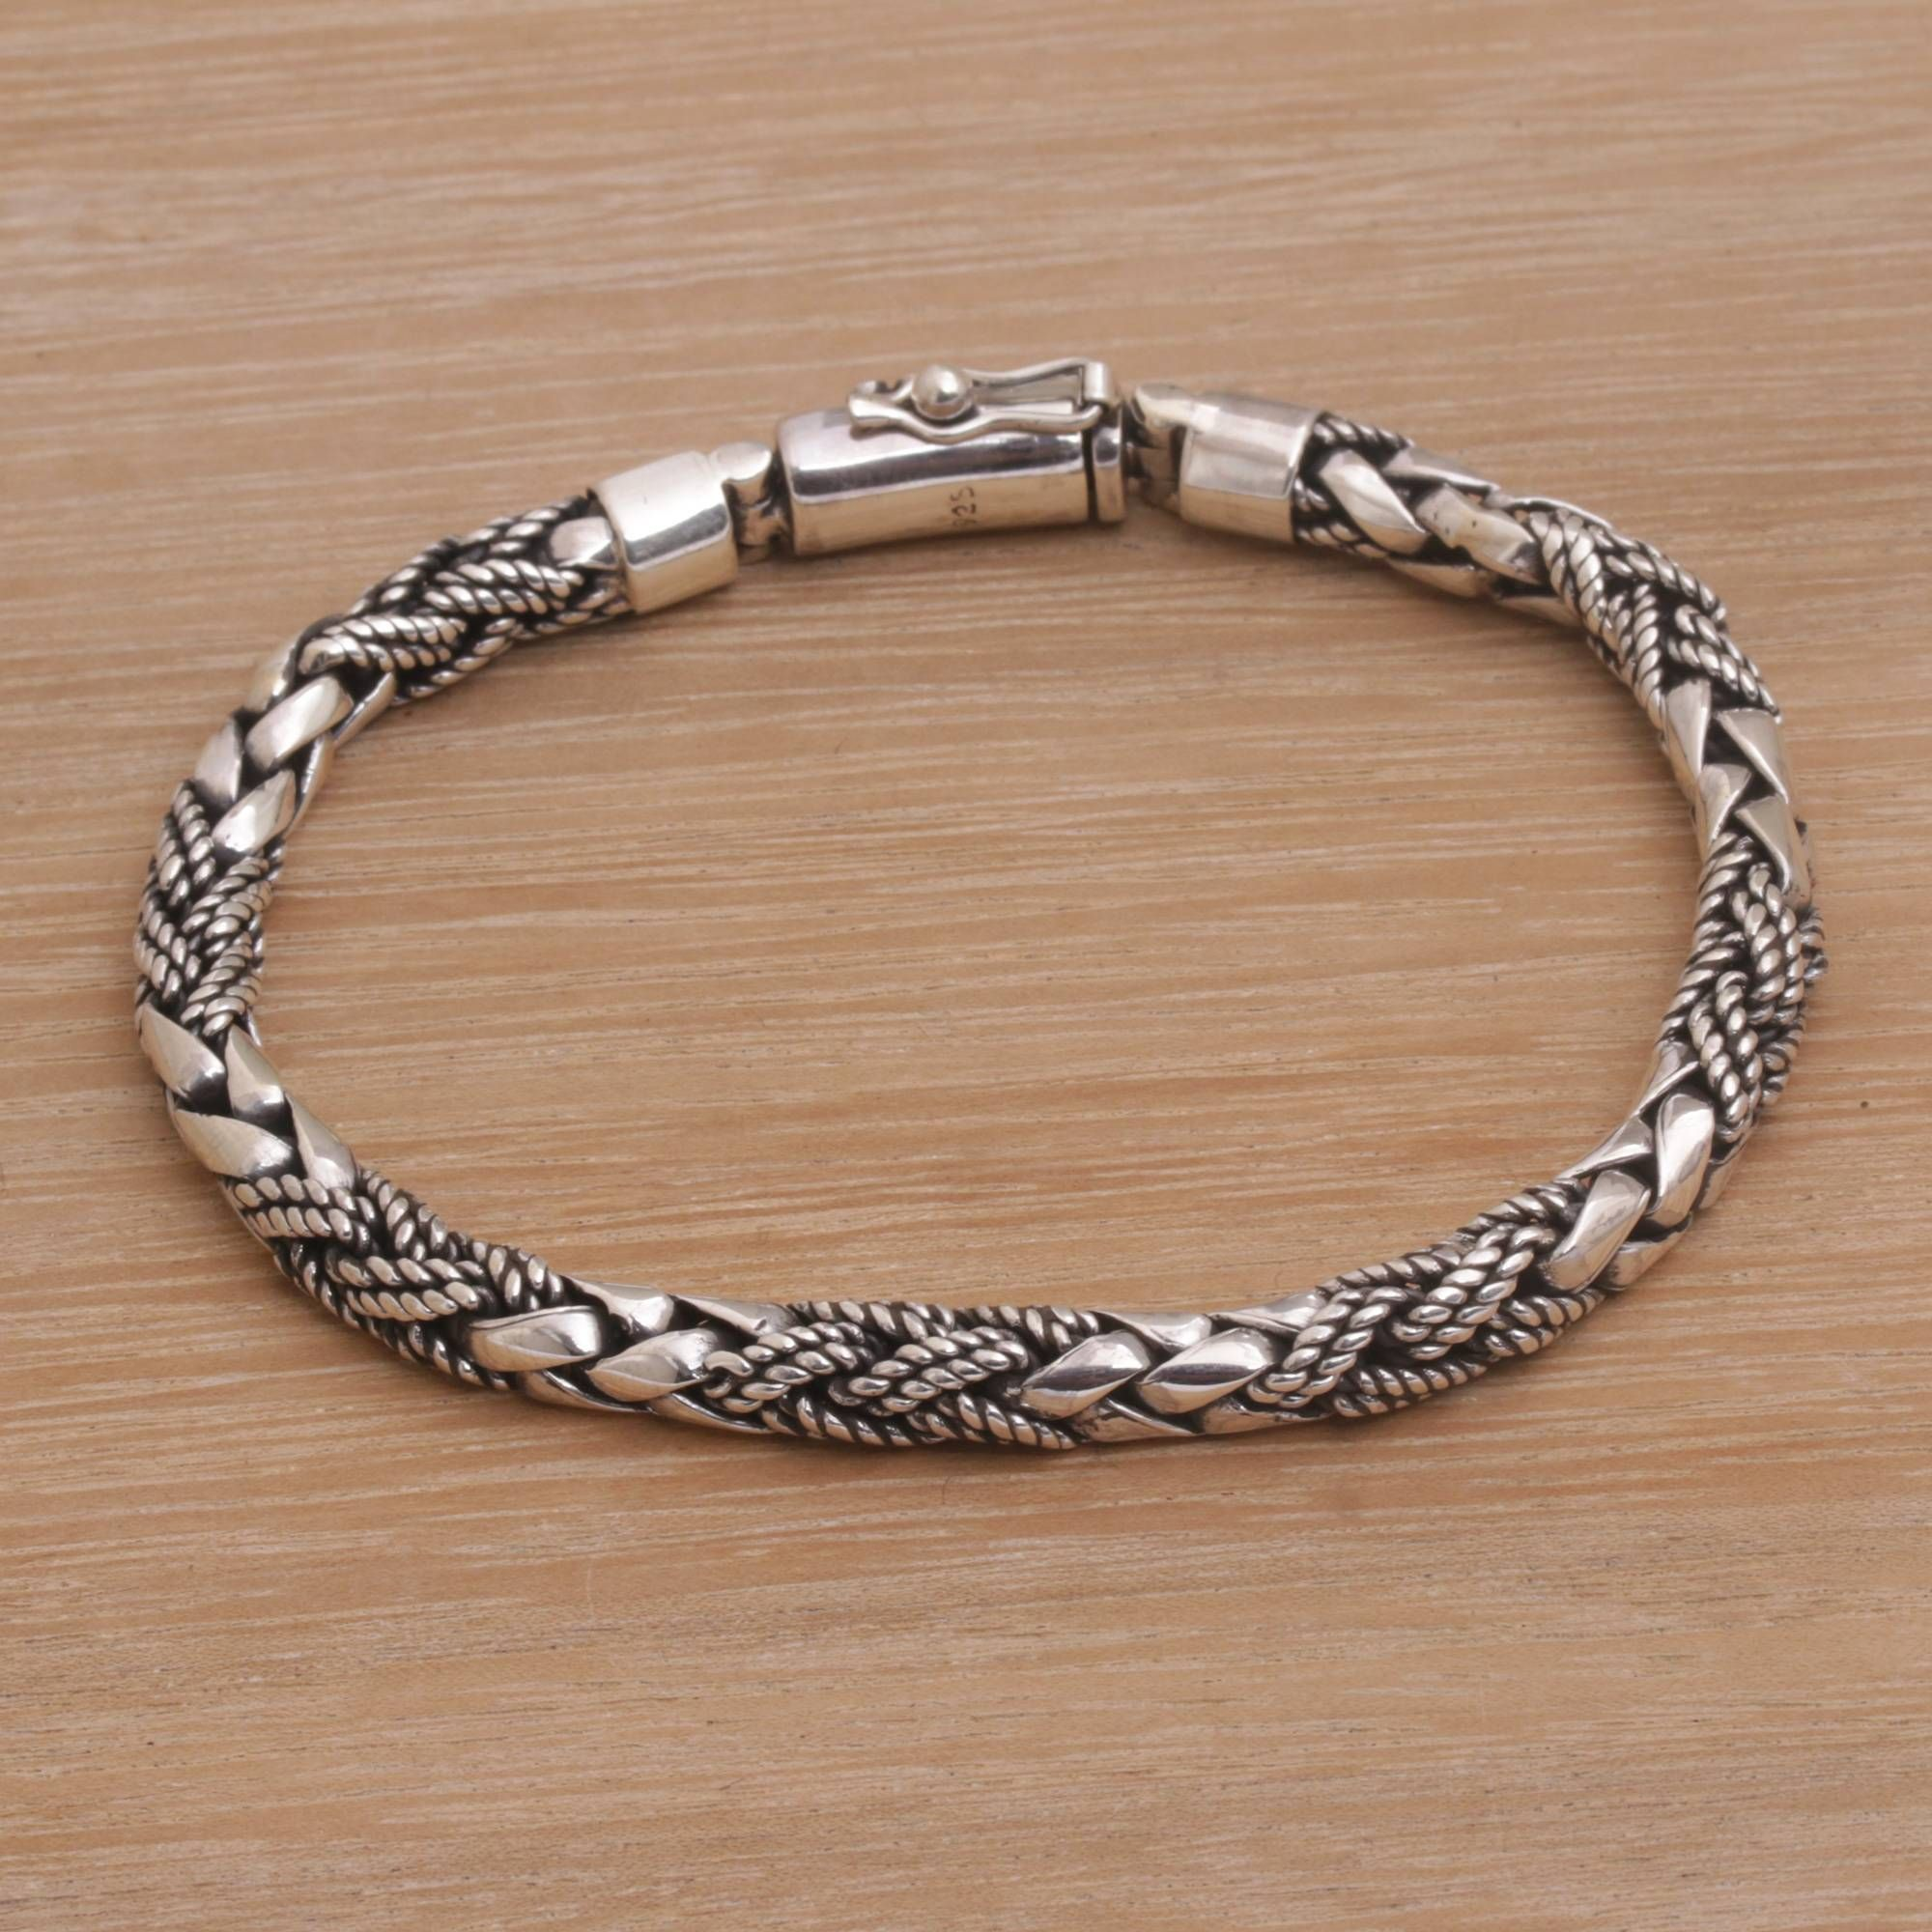 Sterling Silver Braided Bracelet Banded Krait Silver Braided Bracelet Silver Bracelets Silver Chain Bracelet